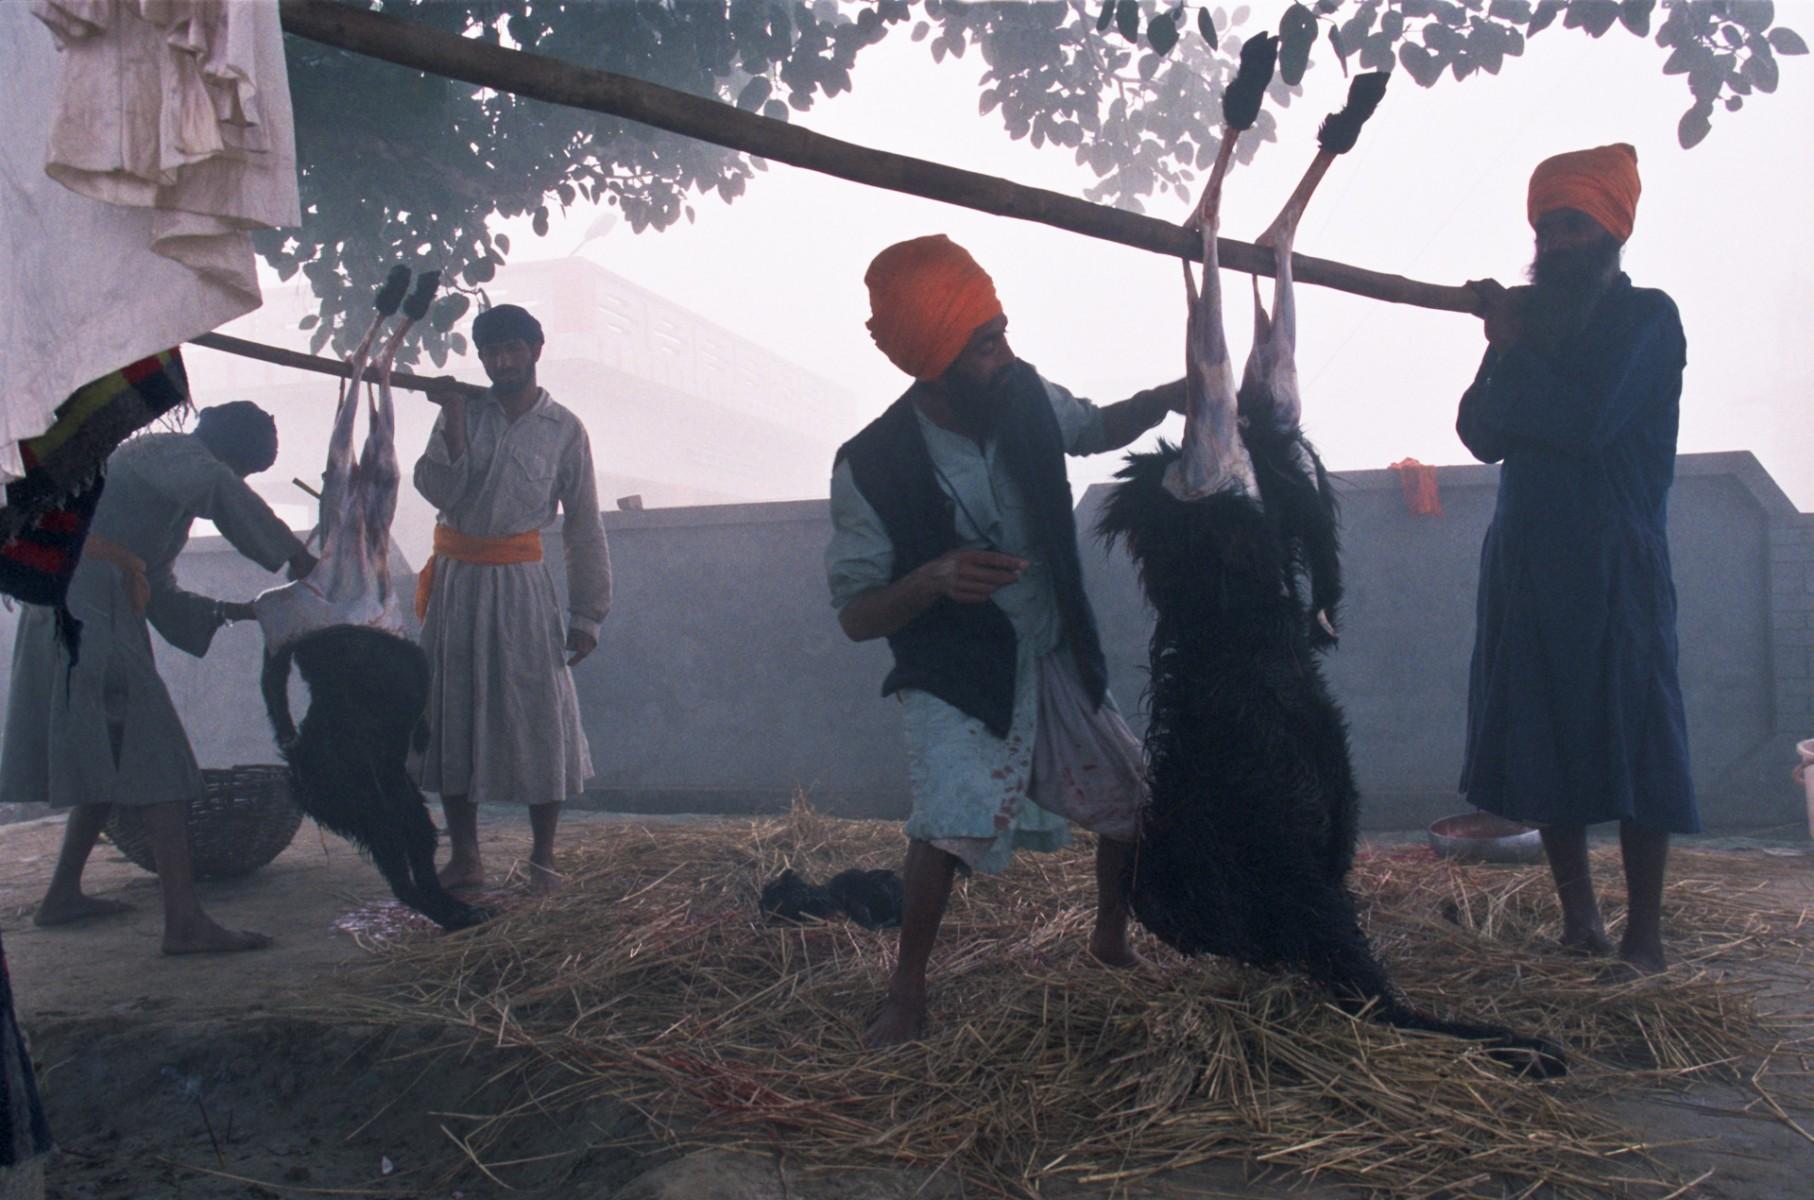 Skinning of the goat